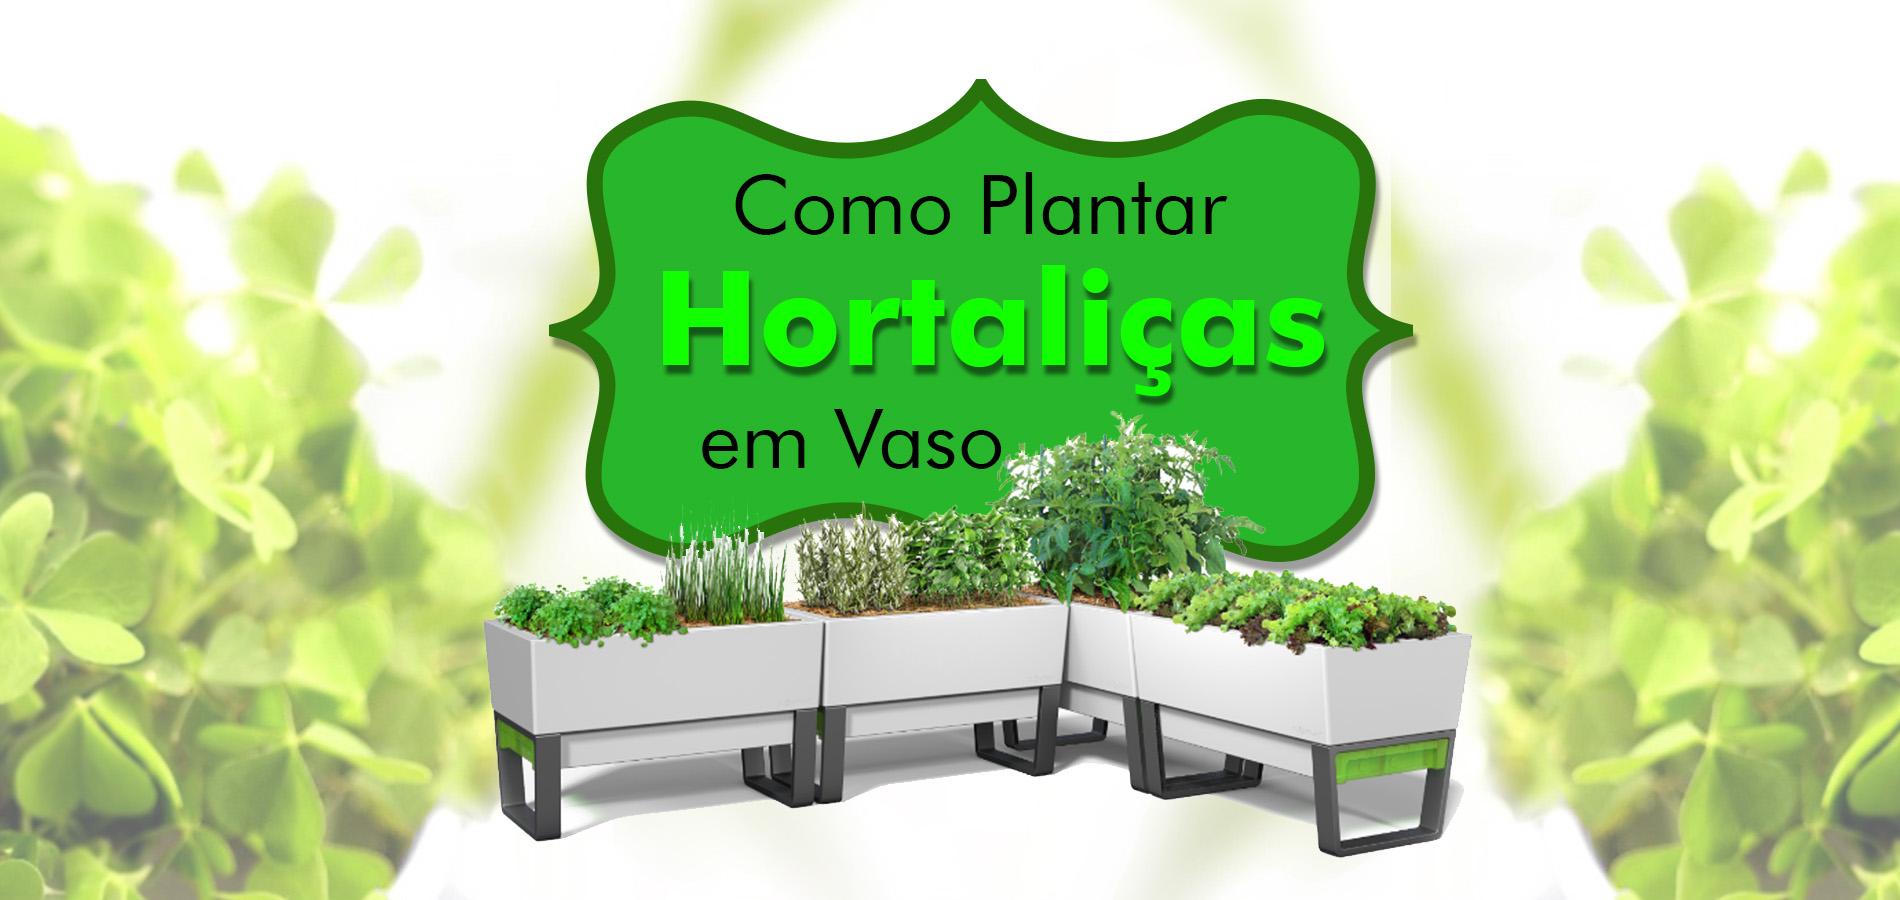 Curso sobre Cultivo de Hortaliças